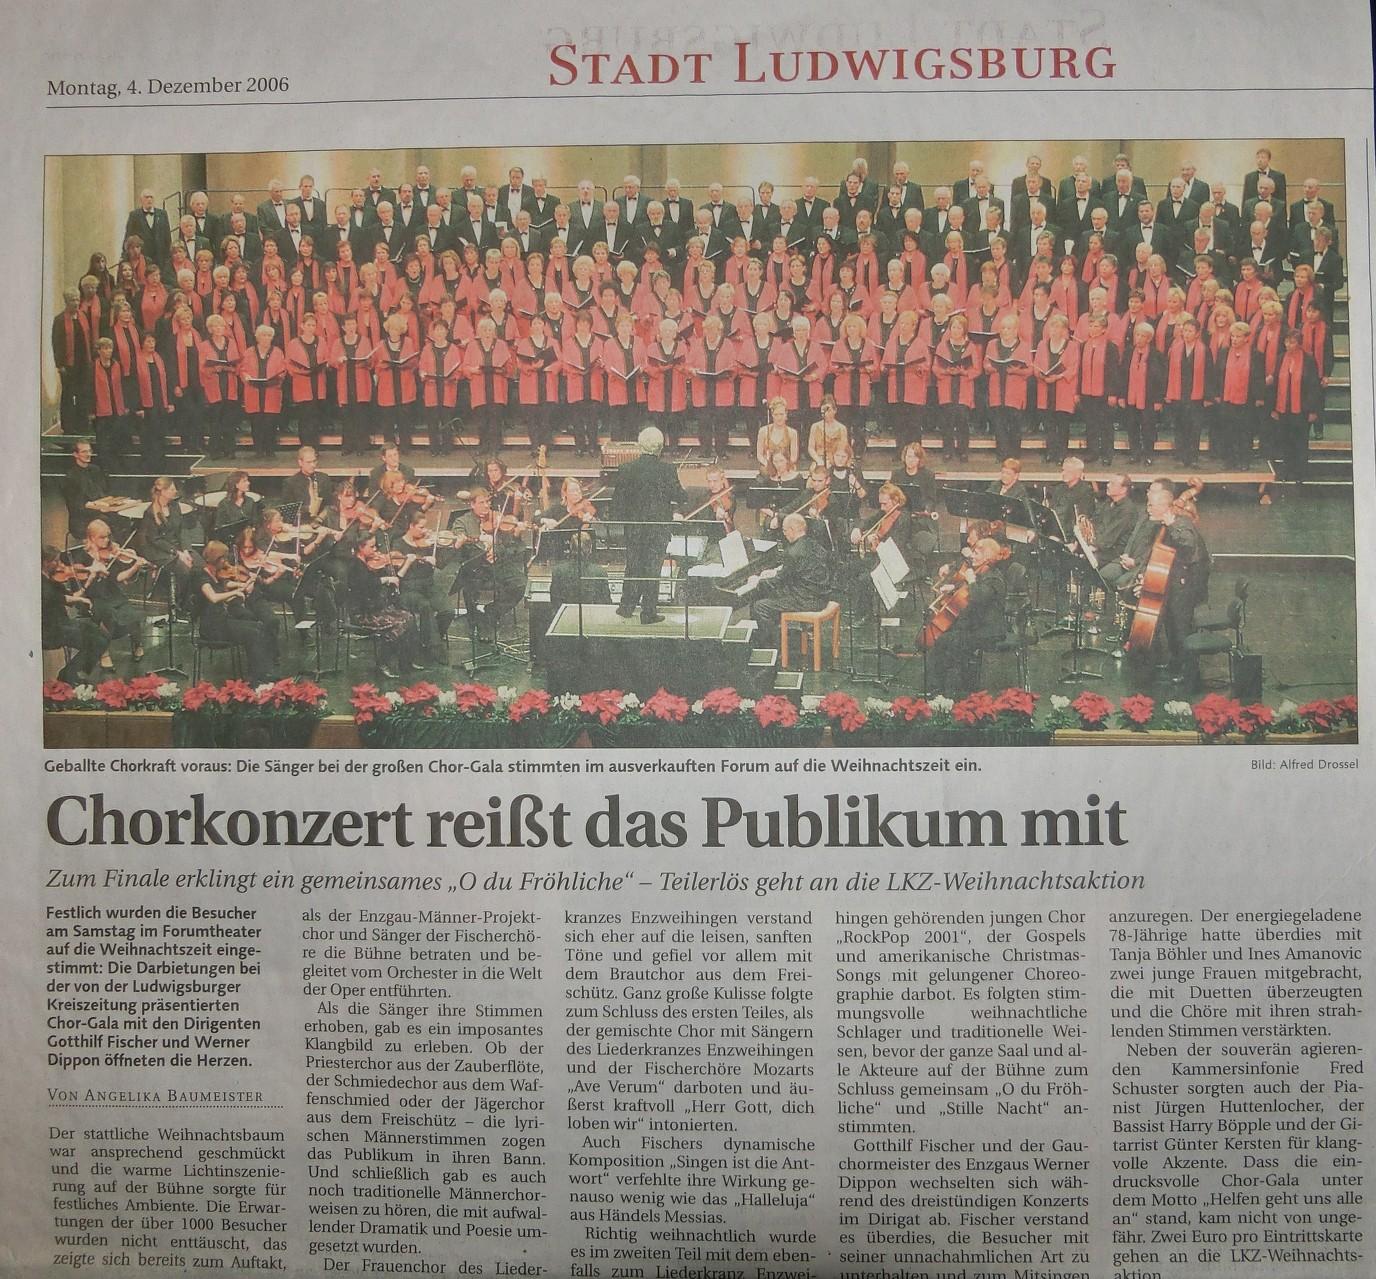 Chor-Gala Forum Ludwigsburg - Ltg. WA  Dippon -